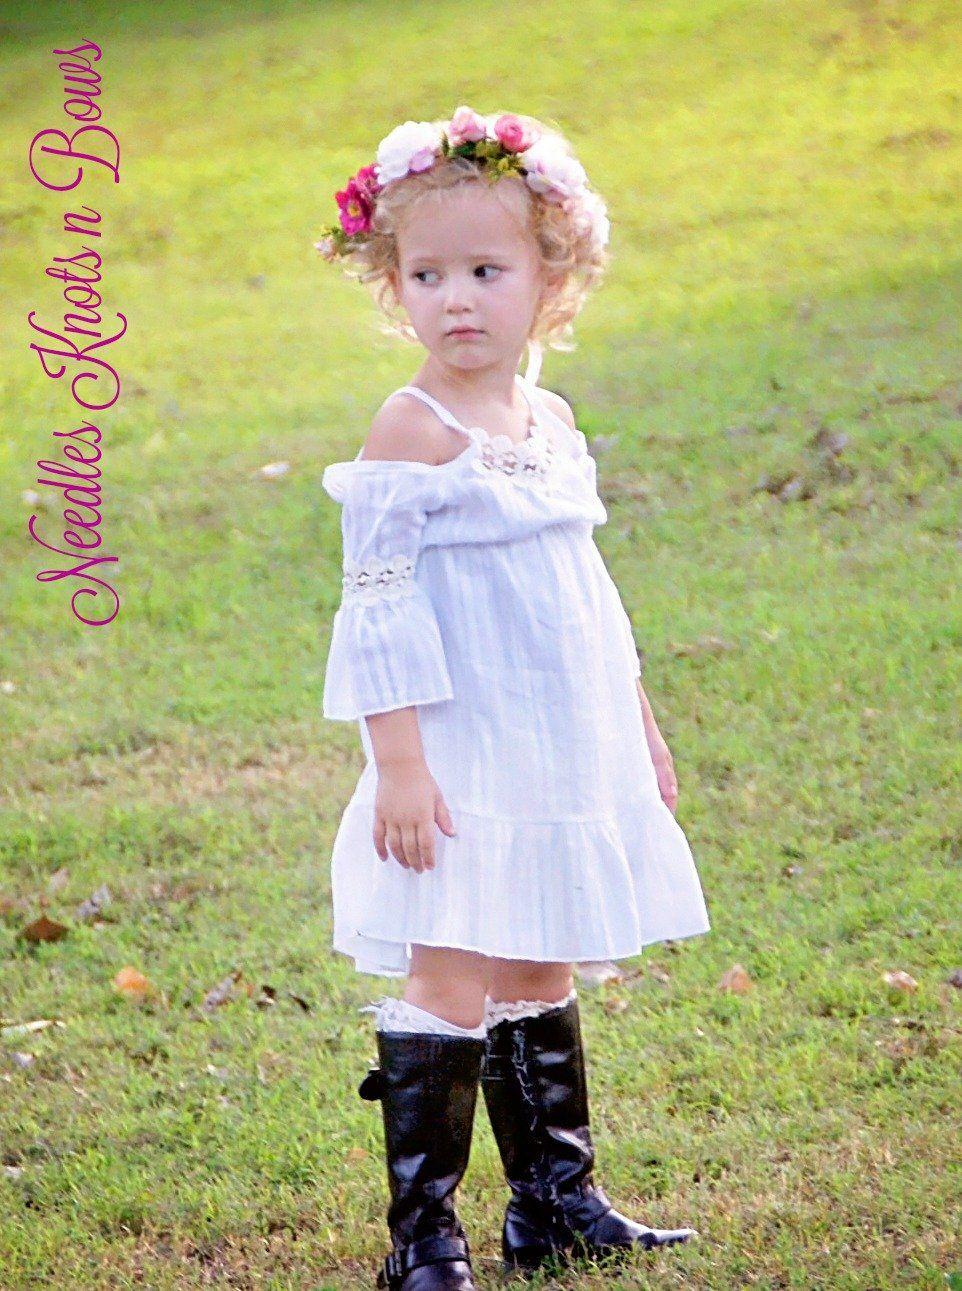 25426d626cec Girls White Over the Shoulder Bohemian Style Dress, Toddlers, Girls Boho Summer  Dress, Beach Dress, Wedding, Flower Girl Dress, Sizes 1, 2, 3, 4, 5, 6, 8,  ...